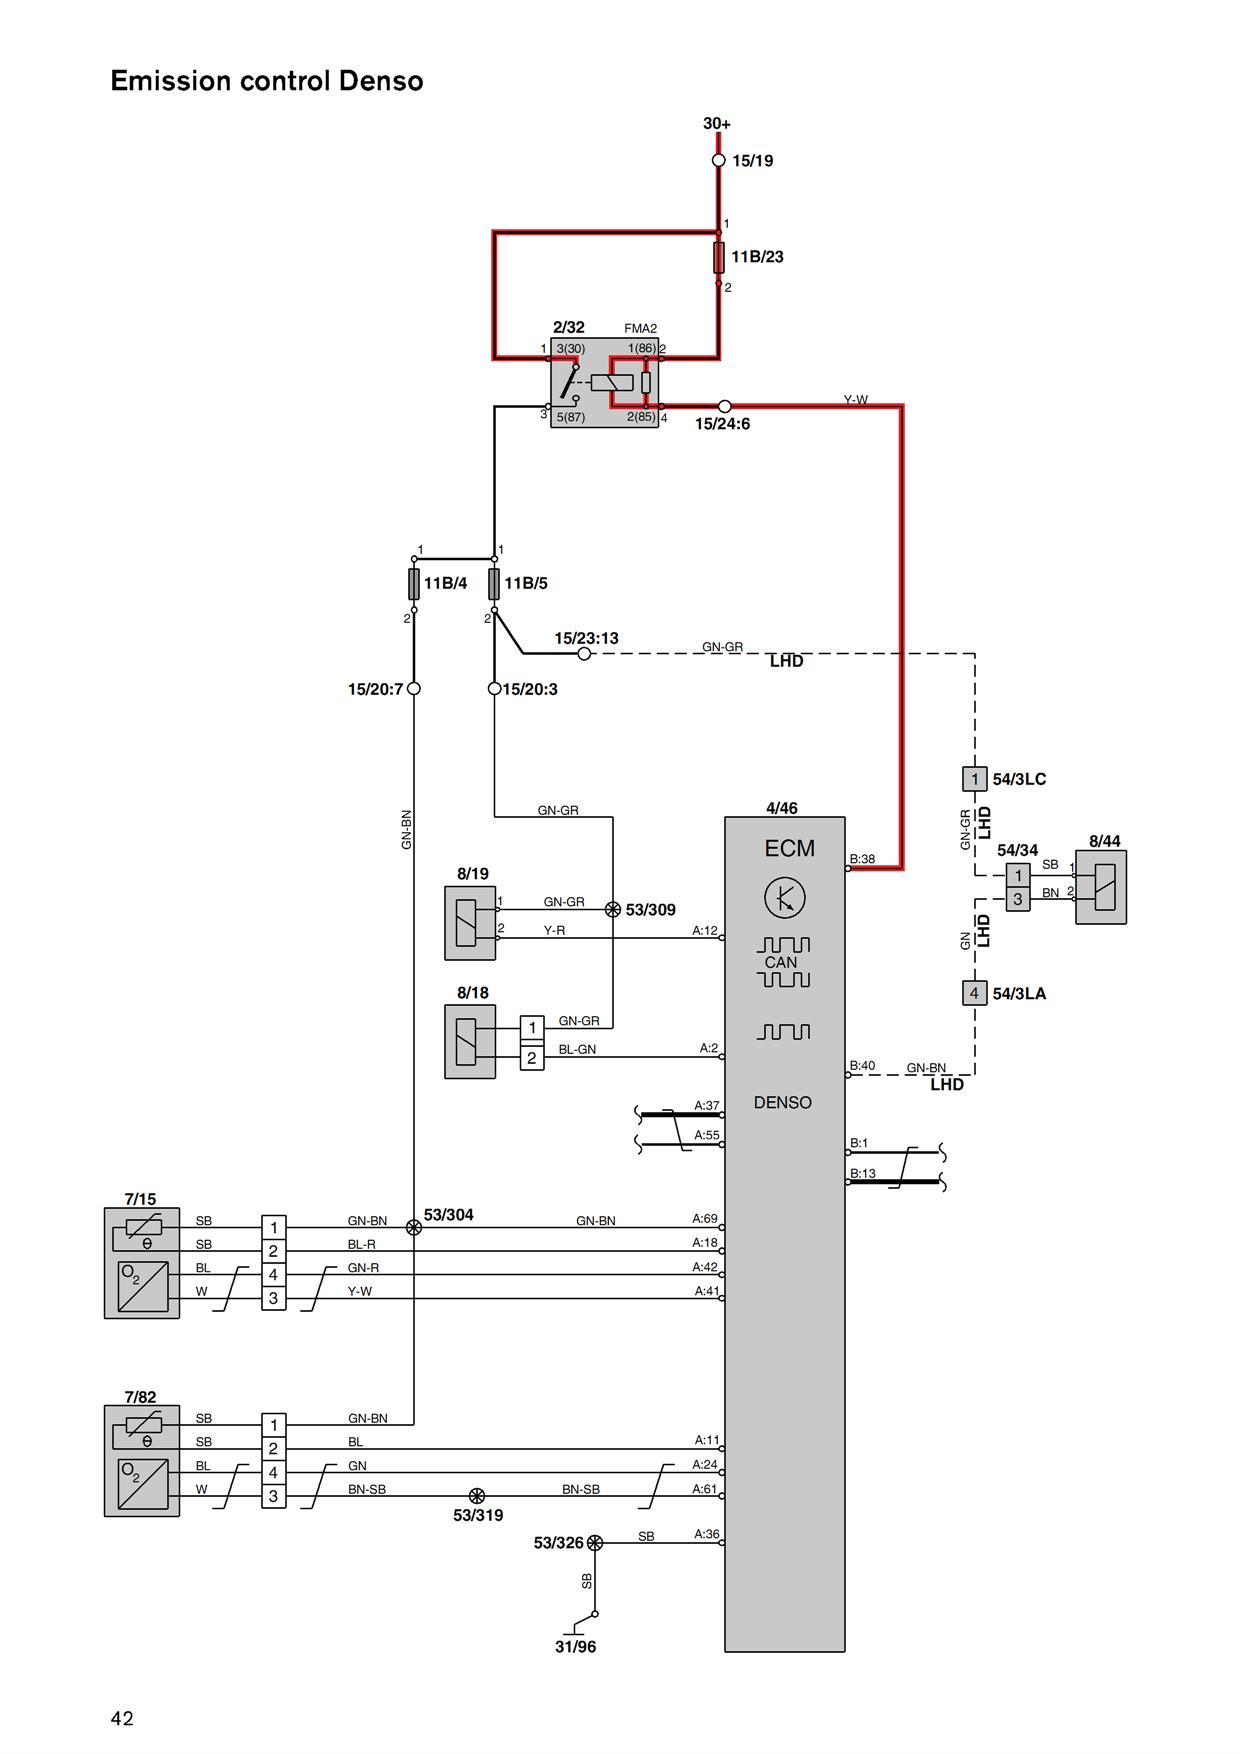 2002 S60 Check Engine Light